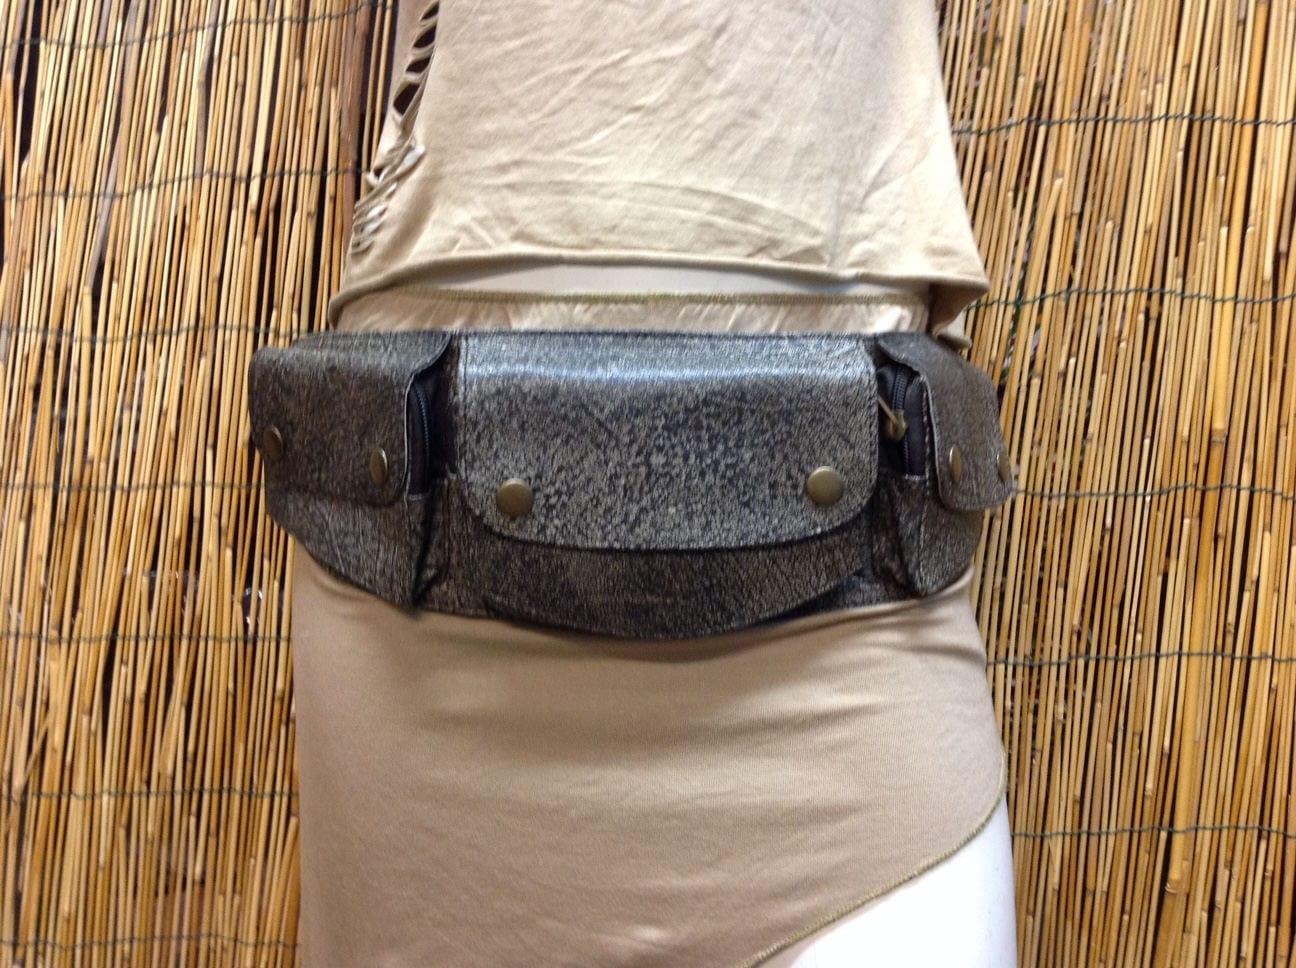 Lumbar Support Belt Shoulder Hip Bag Handbag Travel Of Fur Etsy Tas Waist Barca Zoom